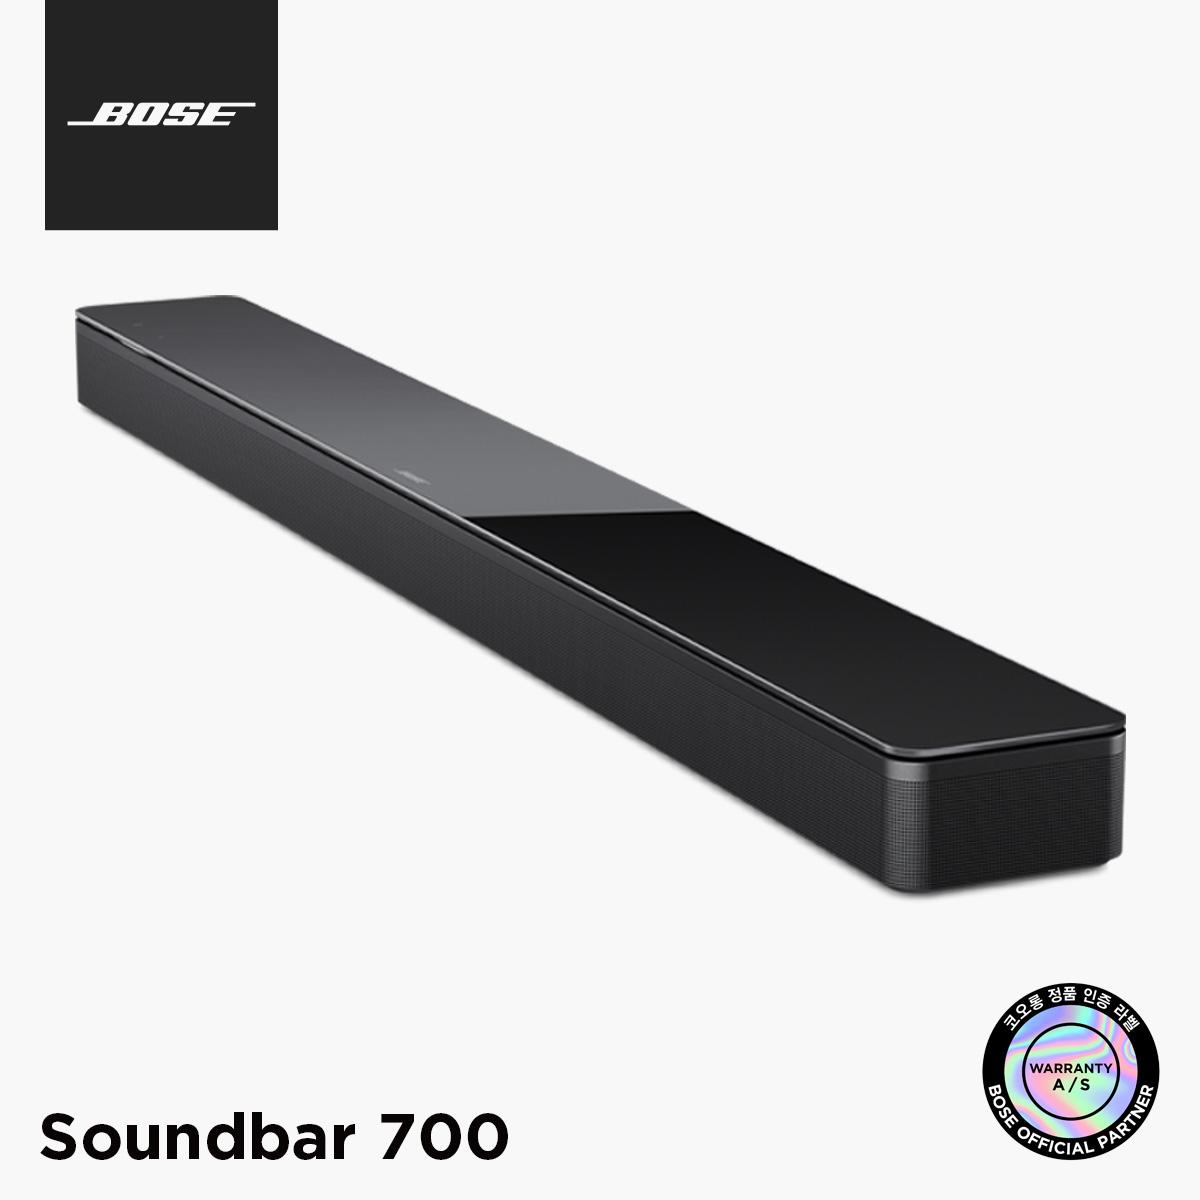 [BOSE] 보스 정품 사운드바 700 블루투스 스피커, 아크틱 화이트